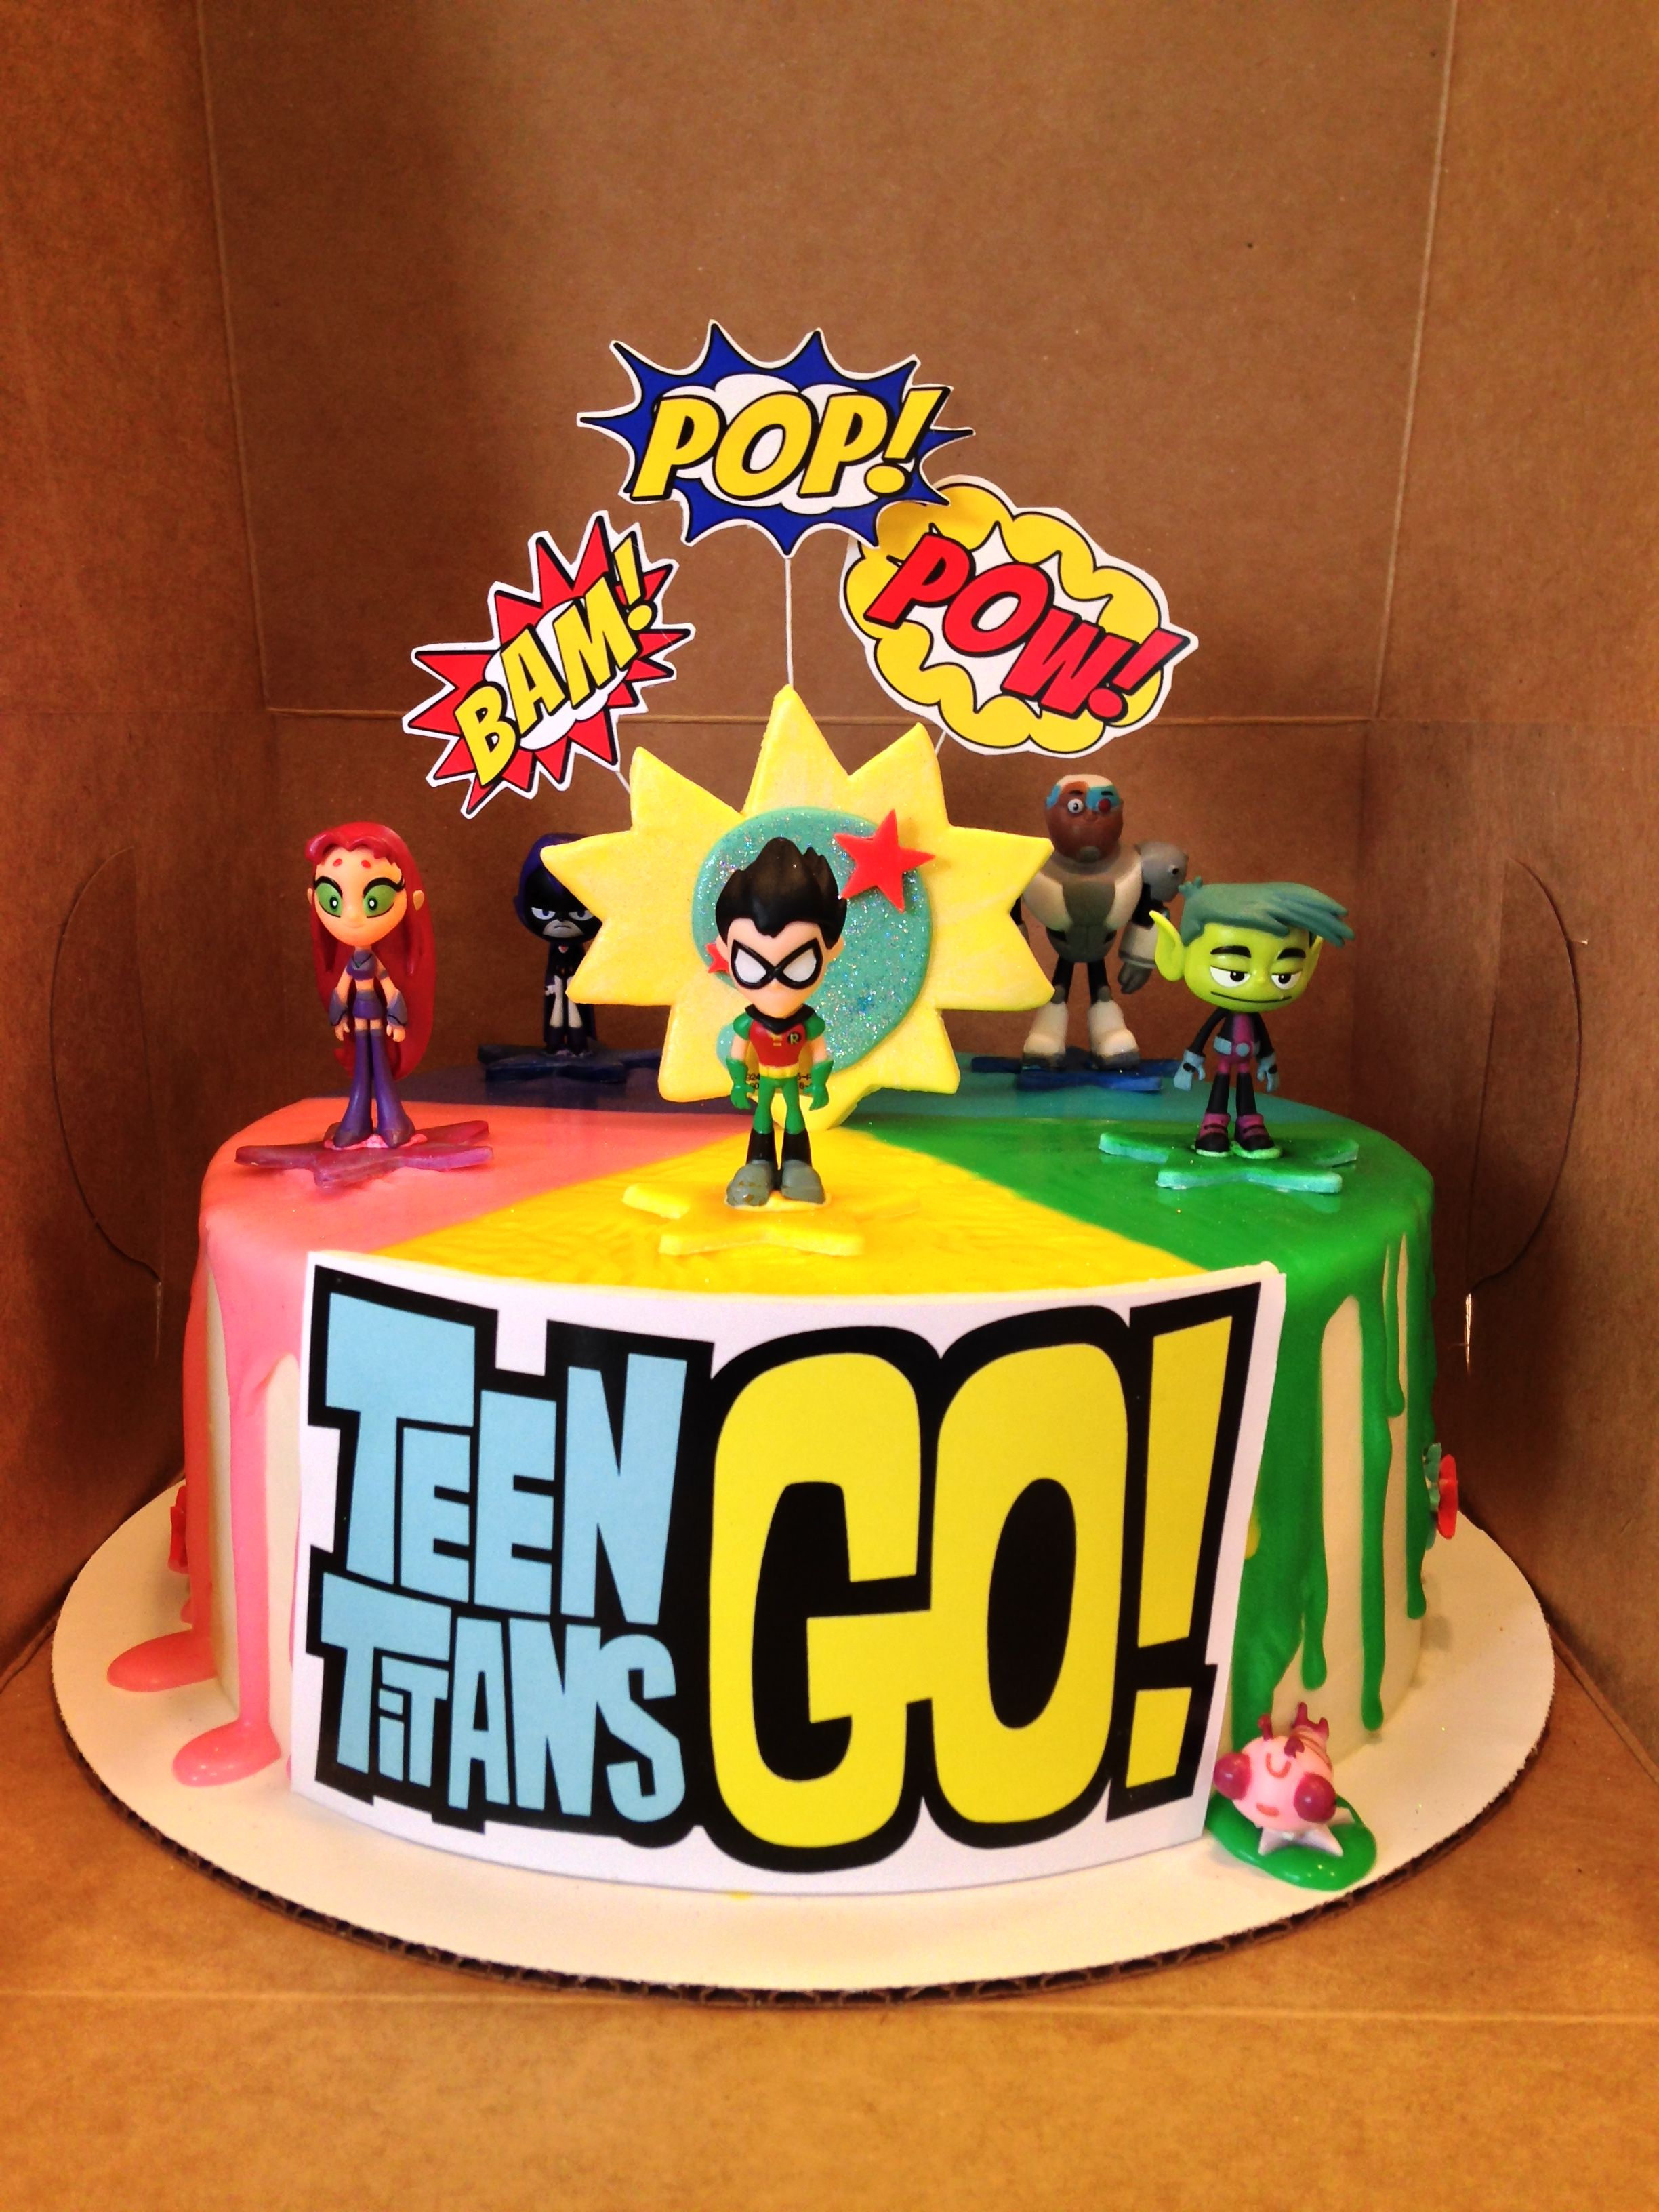 Teen Titans Go cake | vintage cakes in 2019 | Birthday, Birthday ...